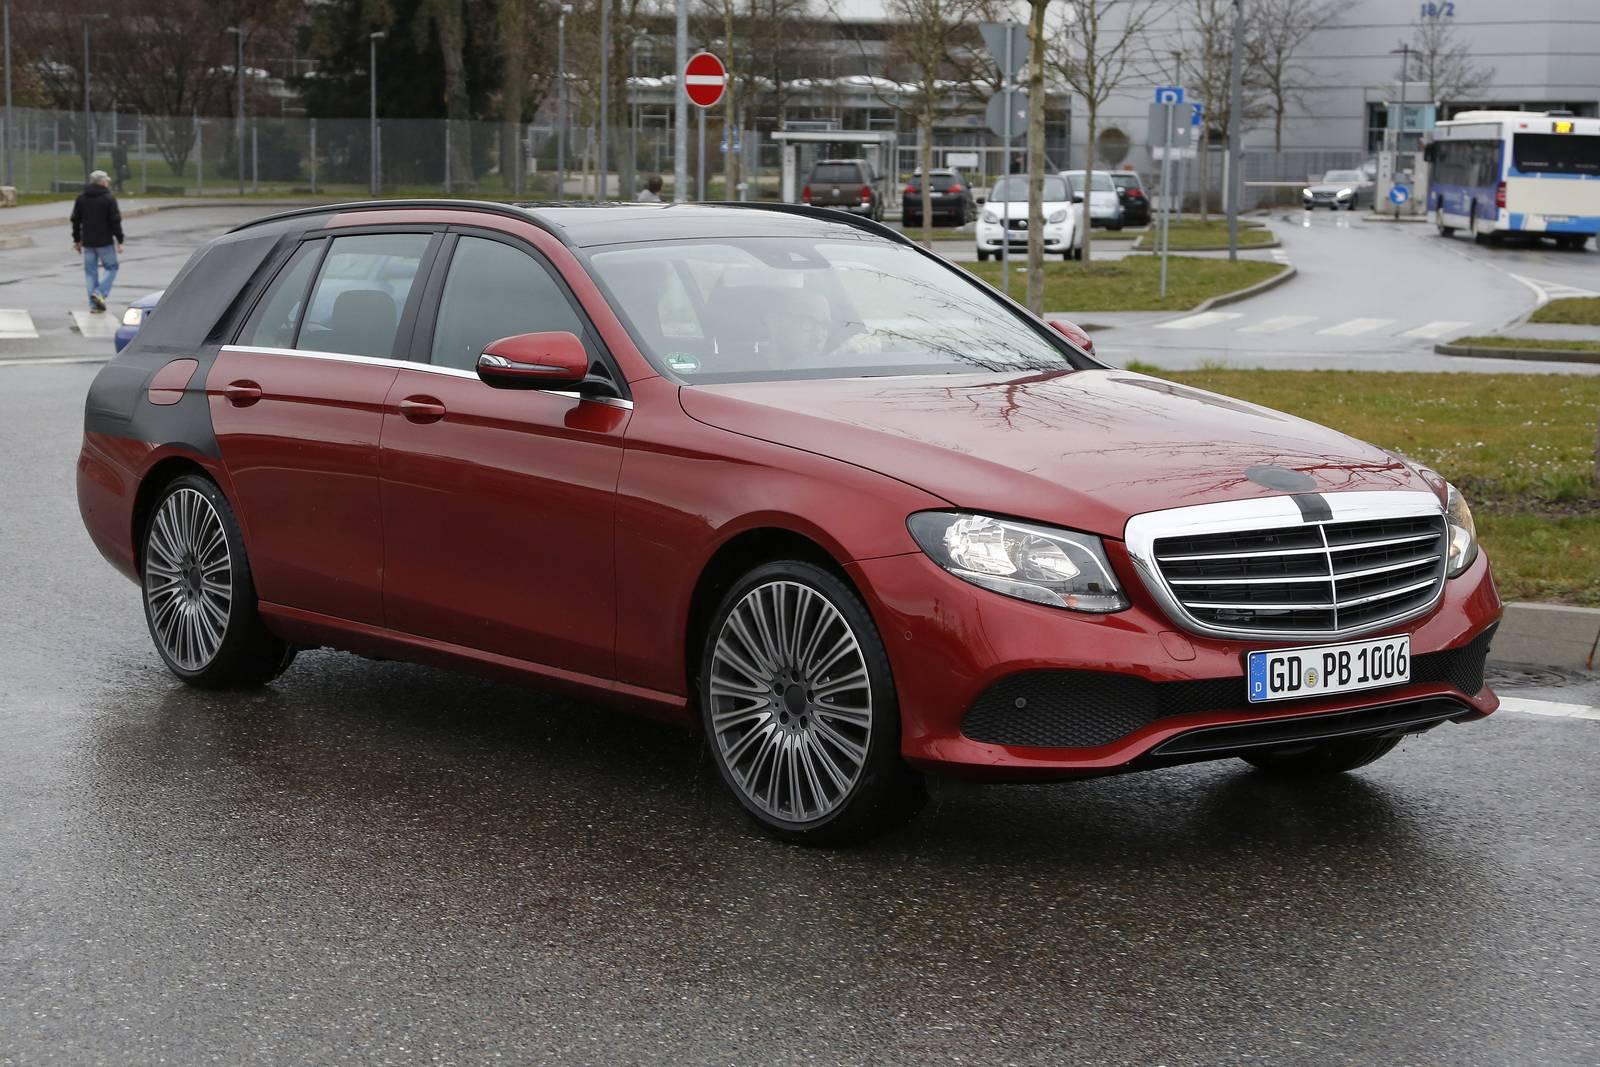 2018 Mercedes-Benz E-Class Estate Naked Spy Shots